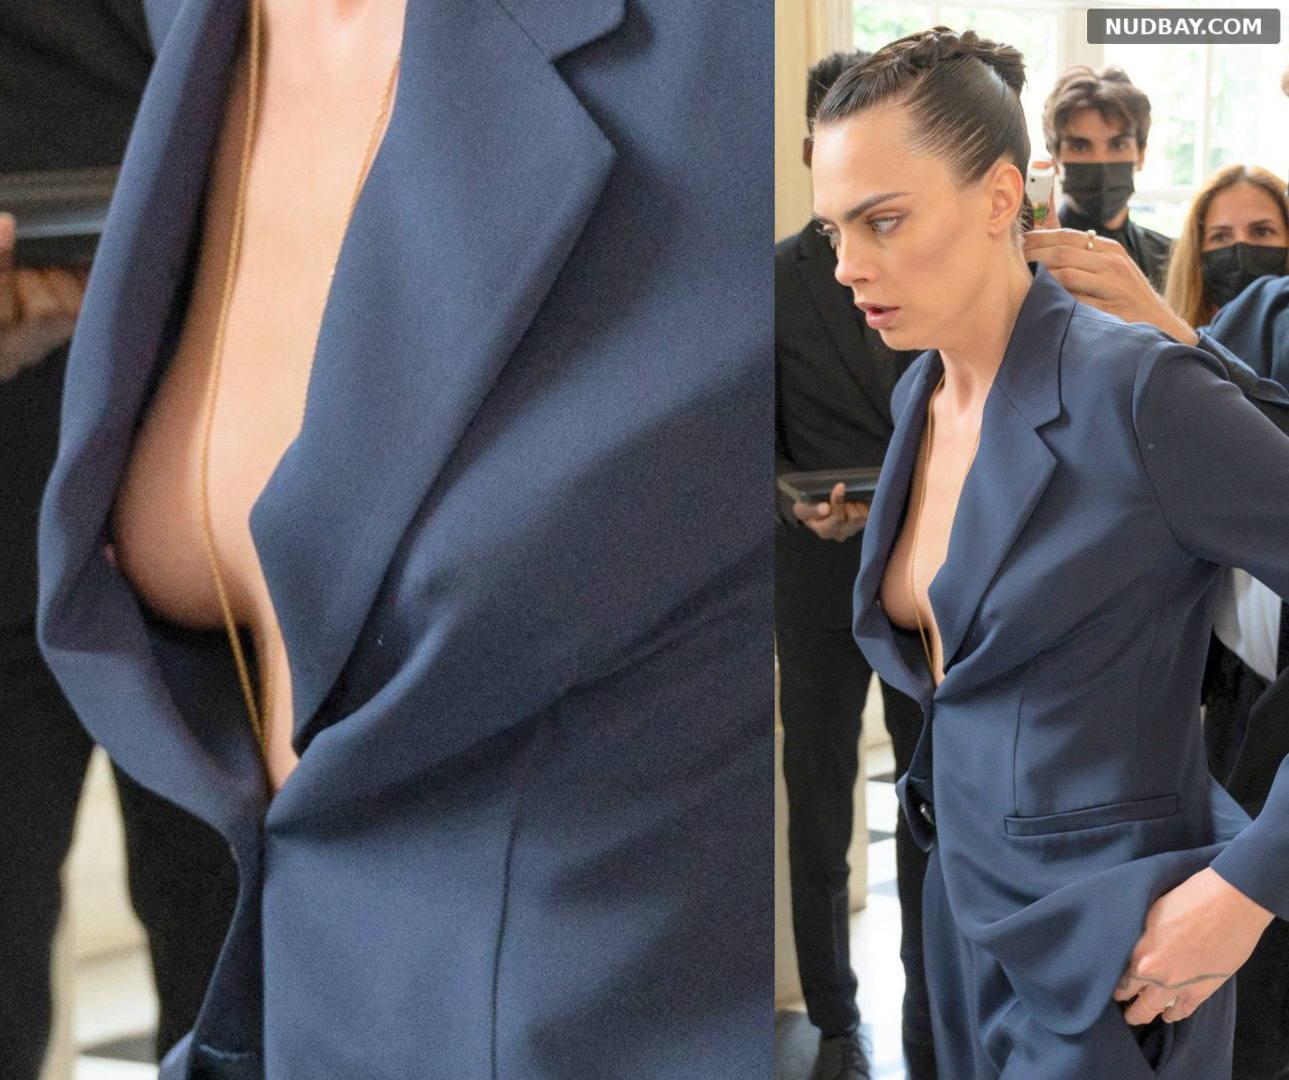 Cara Delevingne Nip slip at Paris Fashion Week Jul 05 2021